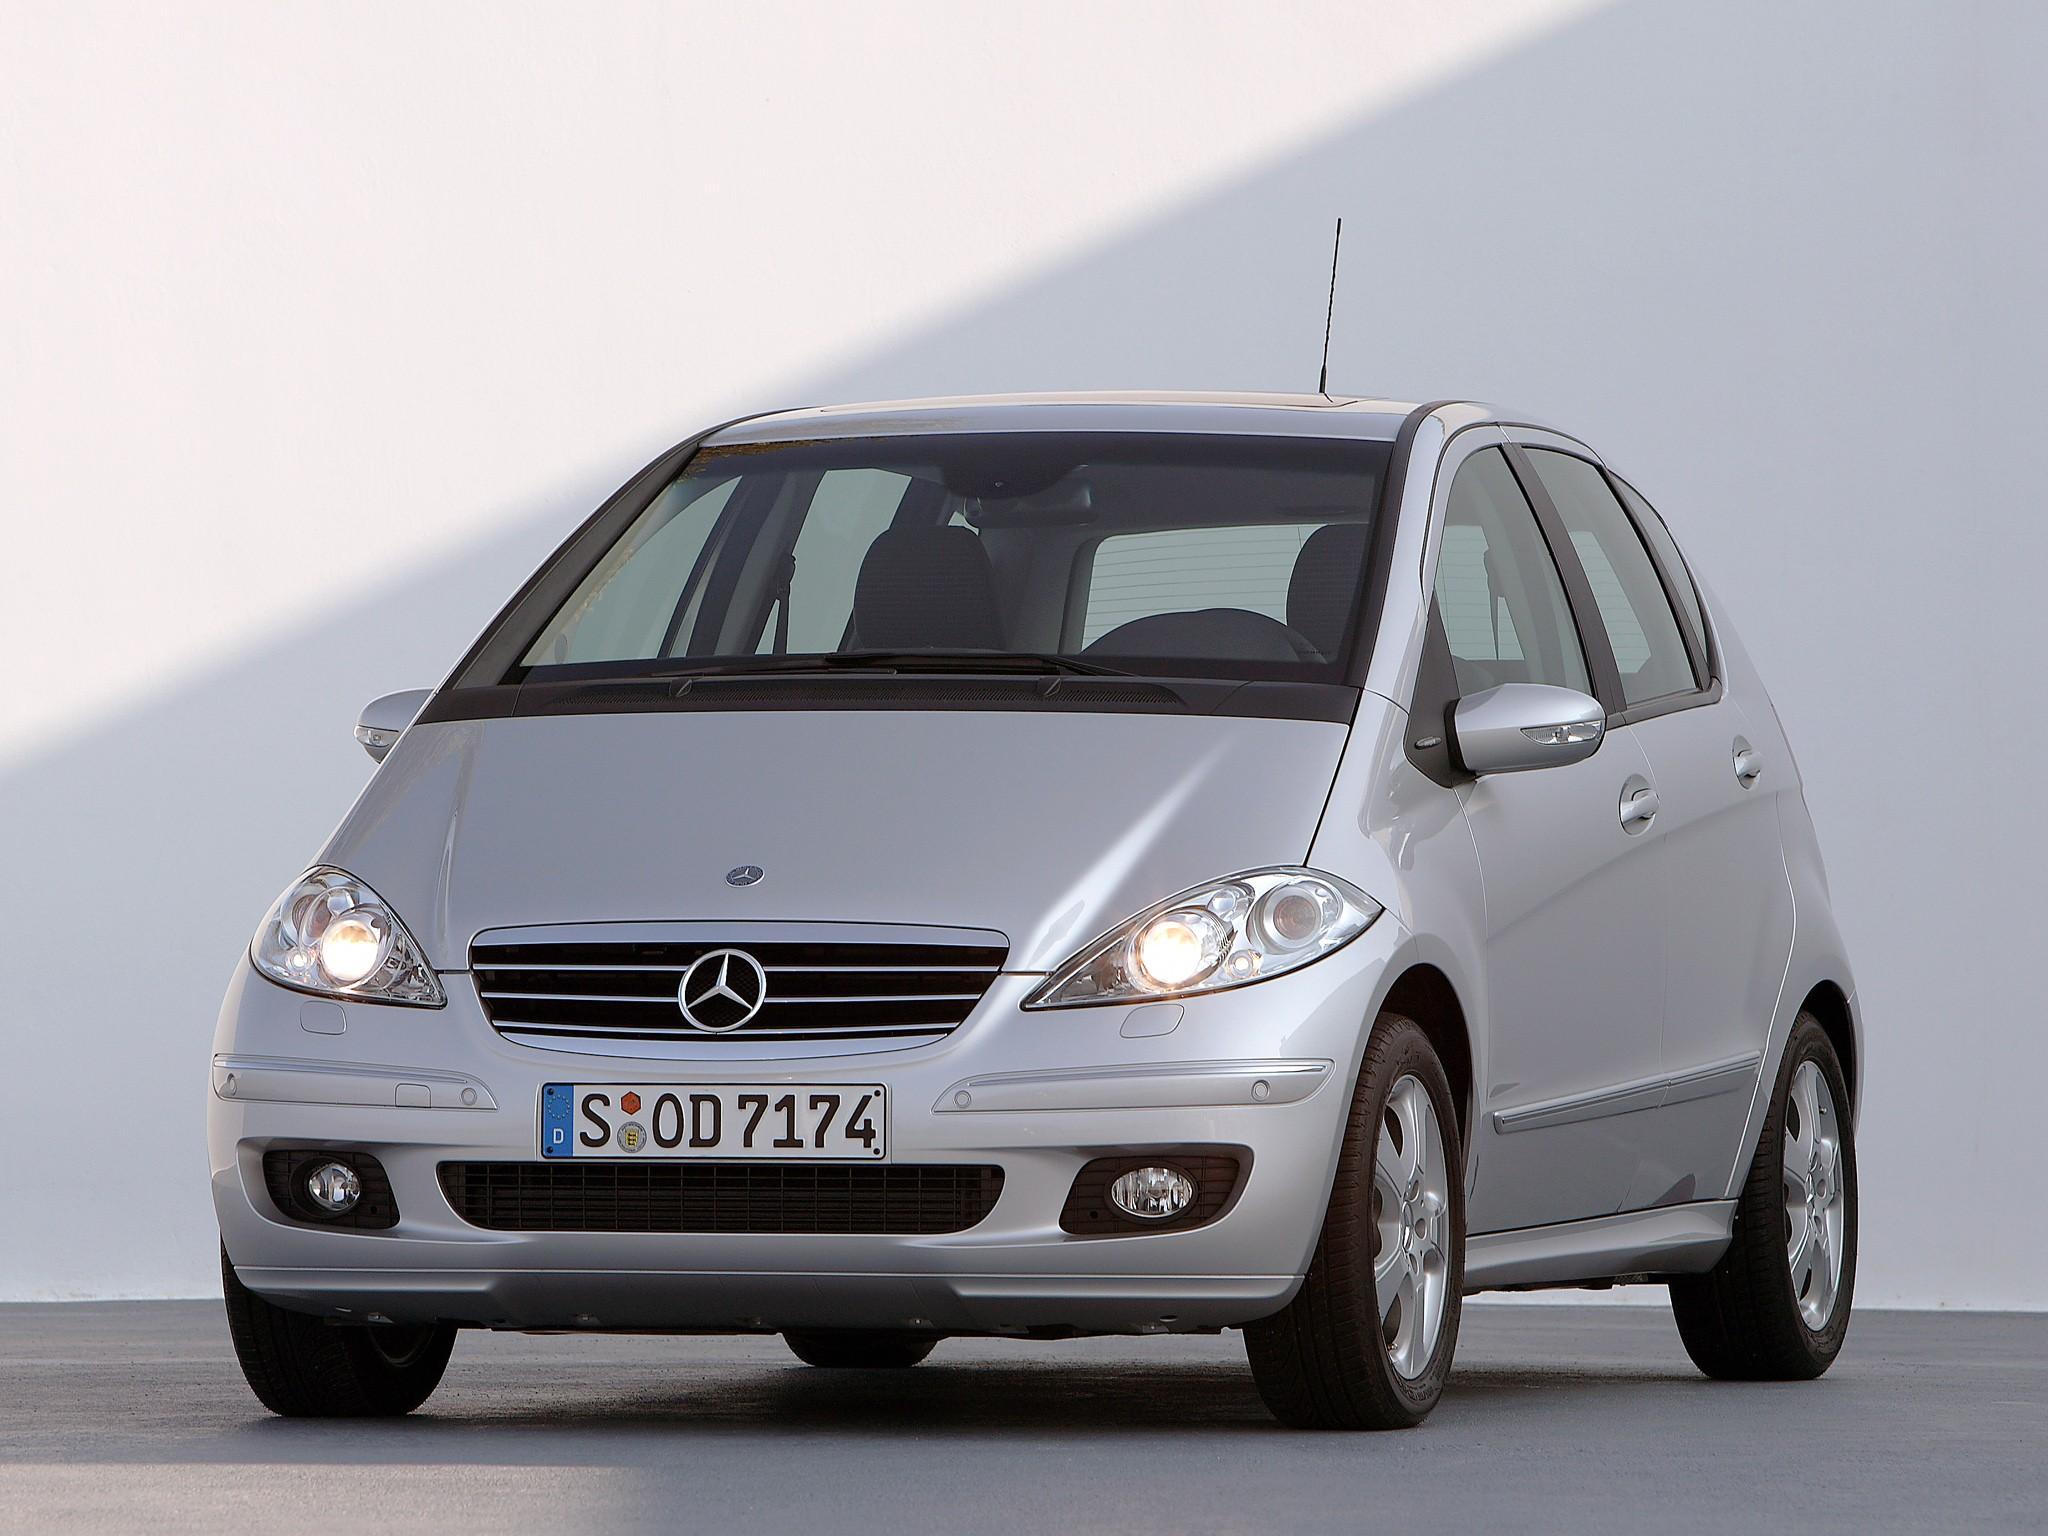 Mercedes Diesel Engines >> MERCEDES BENZ A-Klasse (W169) specs & photos - 2004, 2005 ...